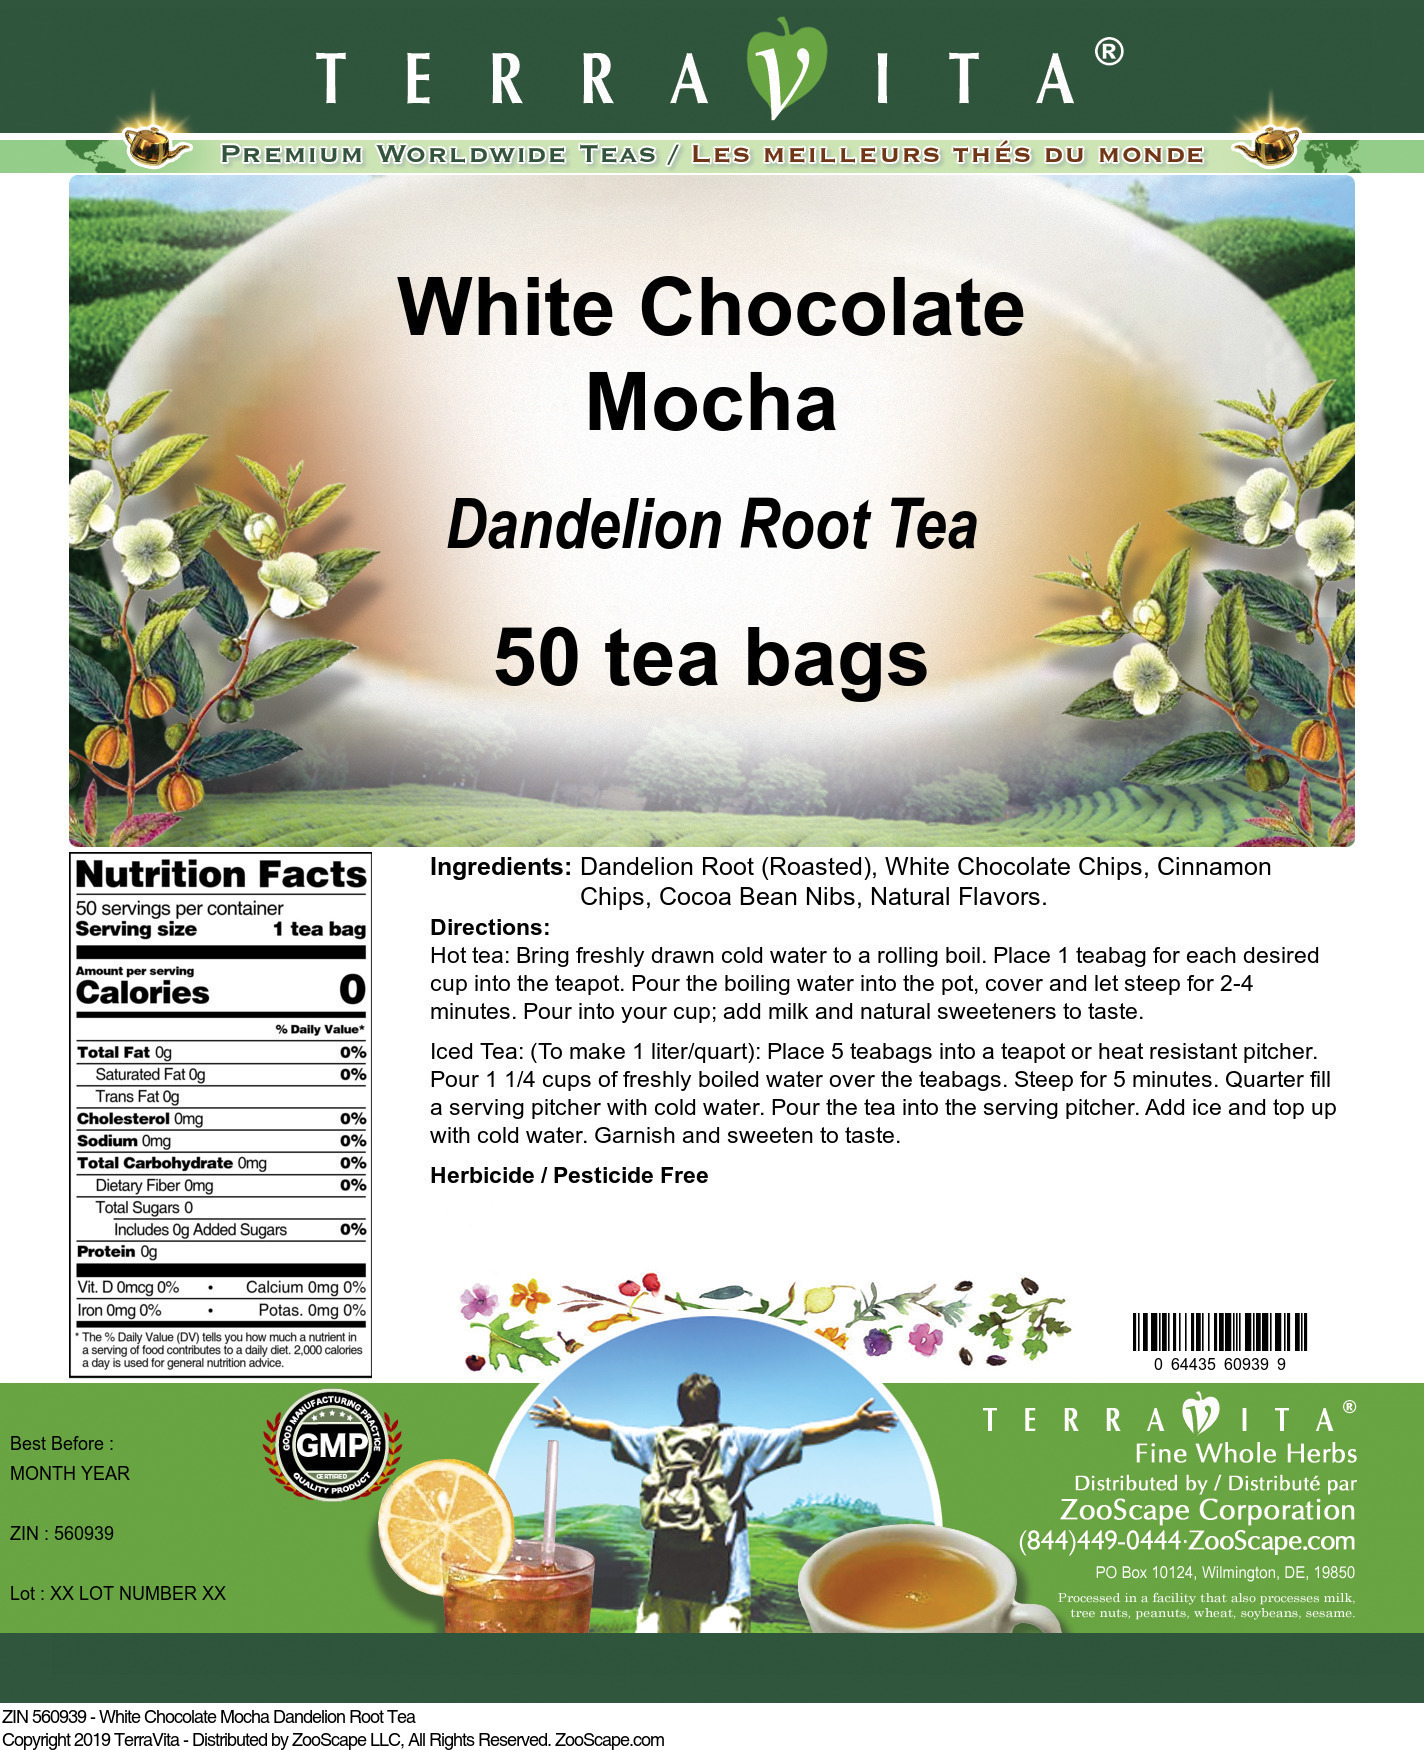 White Chocolate Mocha Dandelion Root Tea